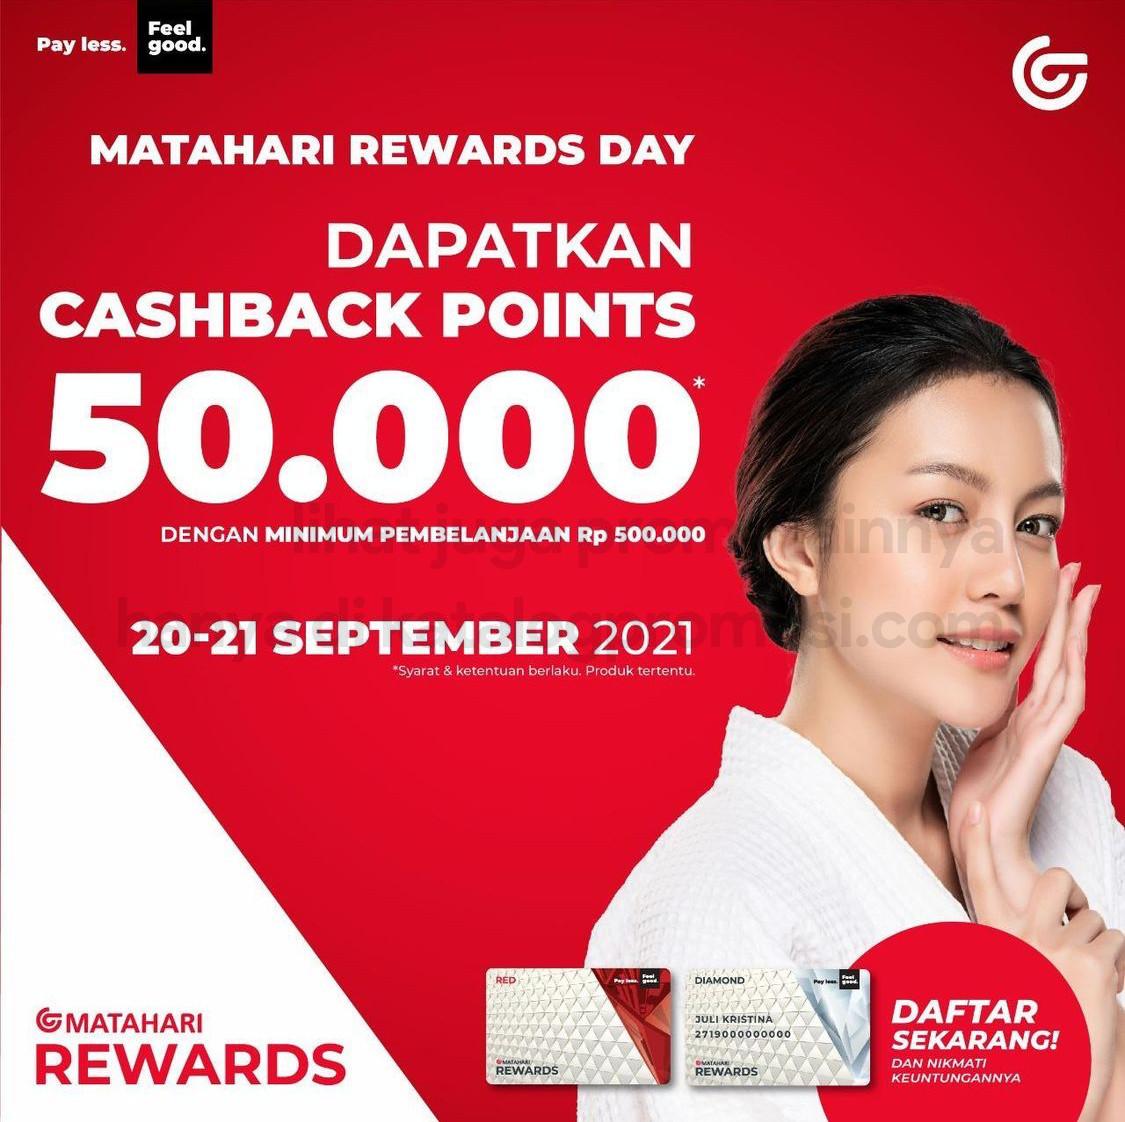 MATAHARI REWARD DAYS! Dapatkan Tambahan Cashback points hingga 50.000poin